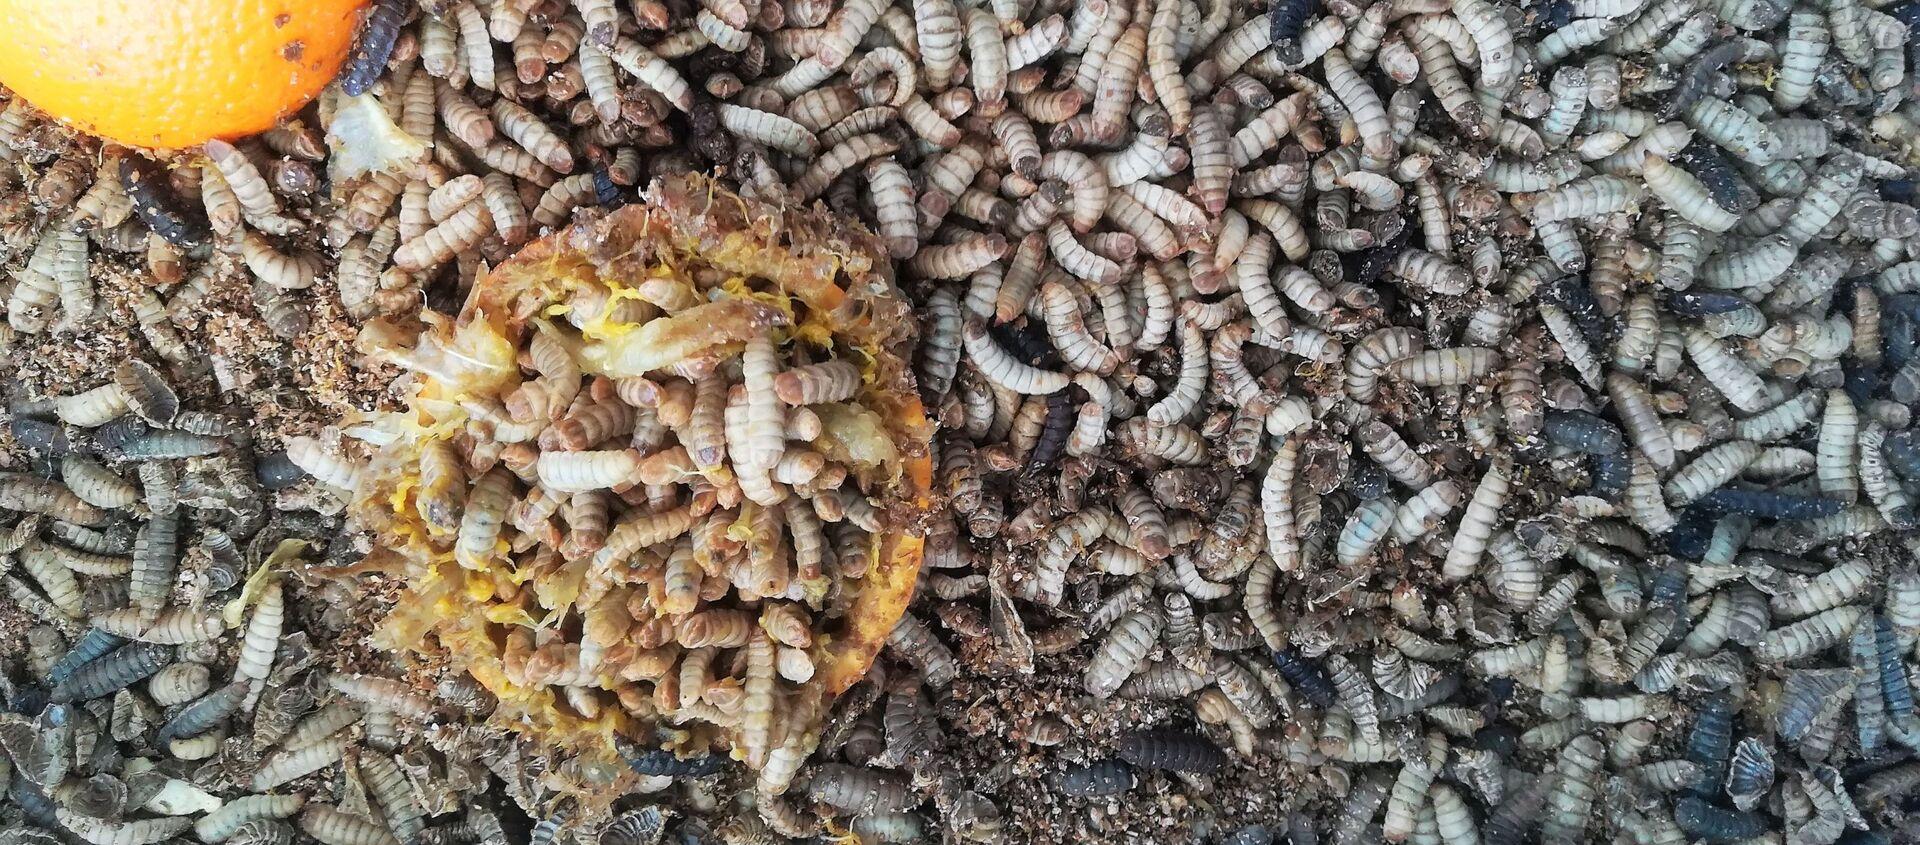 Unas larvas de mosca soldado negra (Hermetia illucens) - Sputnik Mundo, 1920, 05.01.2021